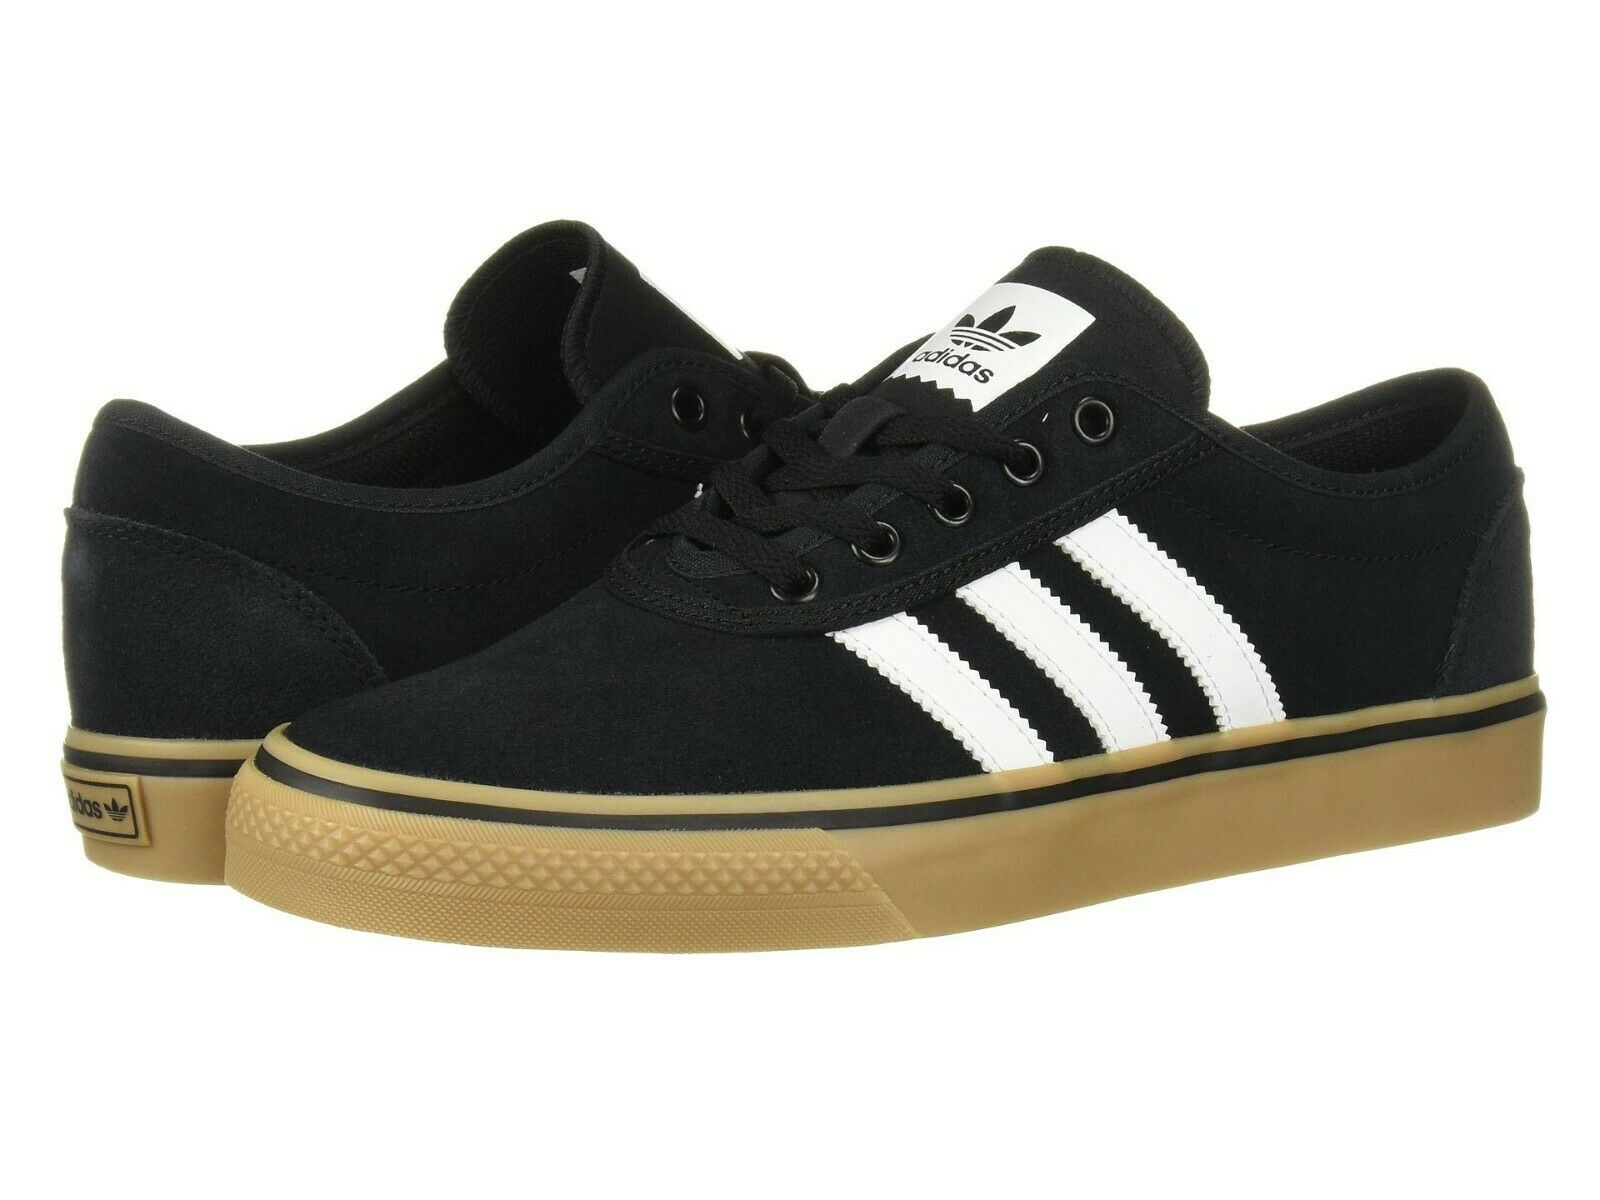 Pesimista implicar Maligno  adidas Boys Shoes Adi Ease J Skateboarding SNEAKERS Scarlett 2 for sale  online   eBay